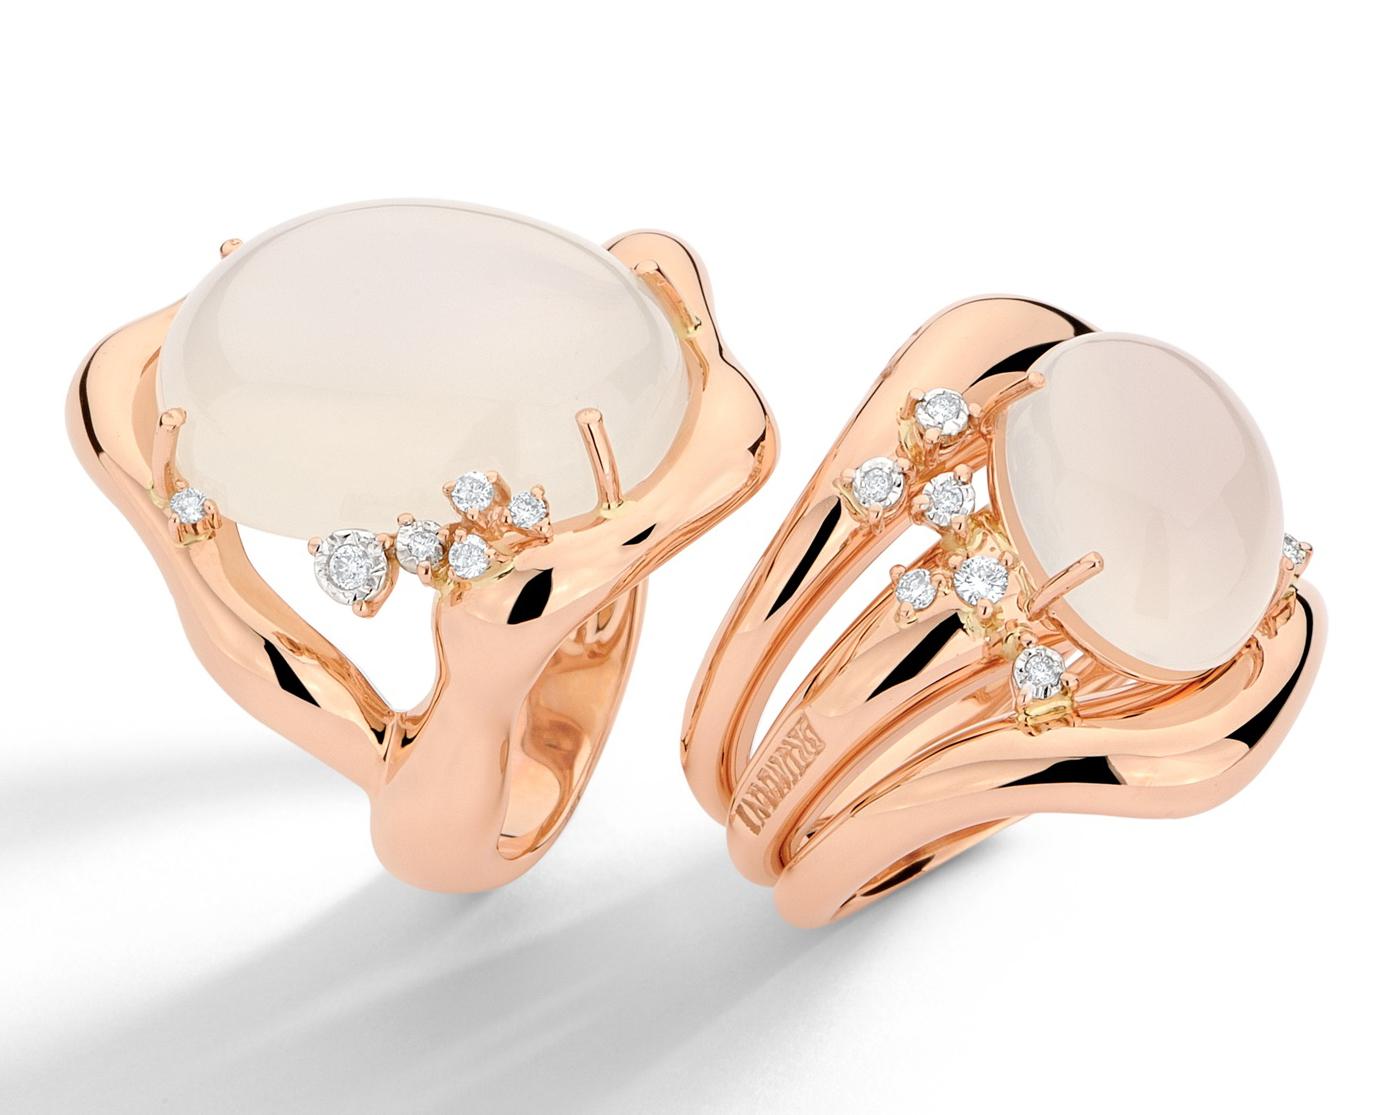 Jewelry News Network Brumani Boasts Brazilian Artistry